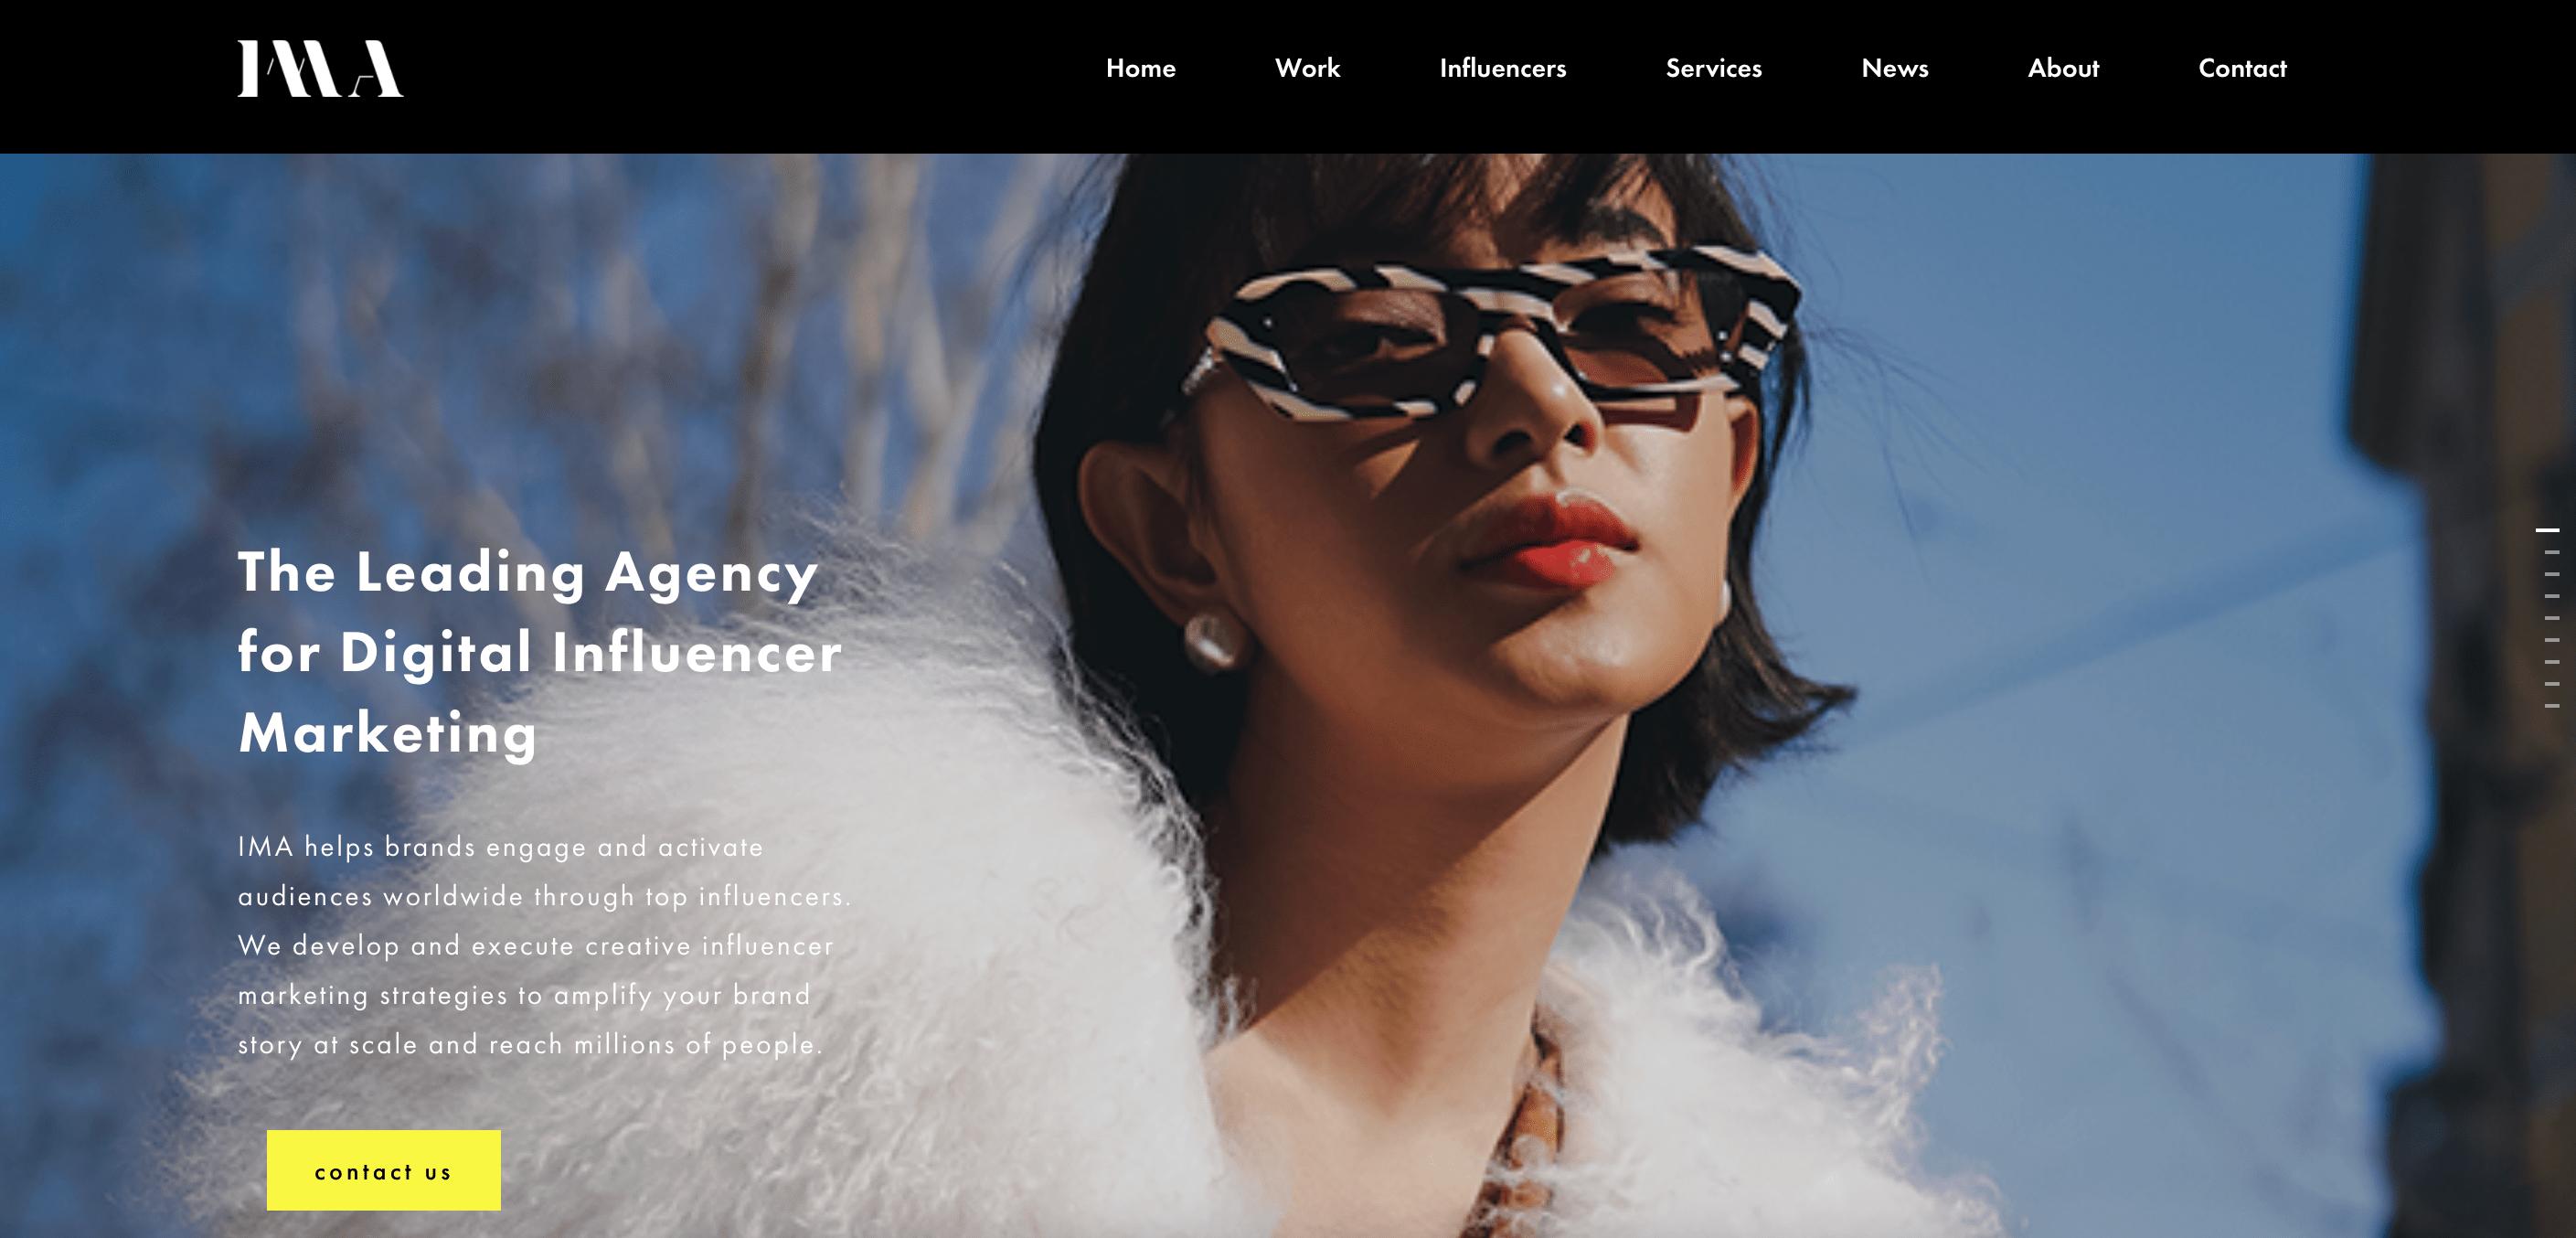 IMA-digital-influencer-marketing-agency